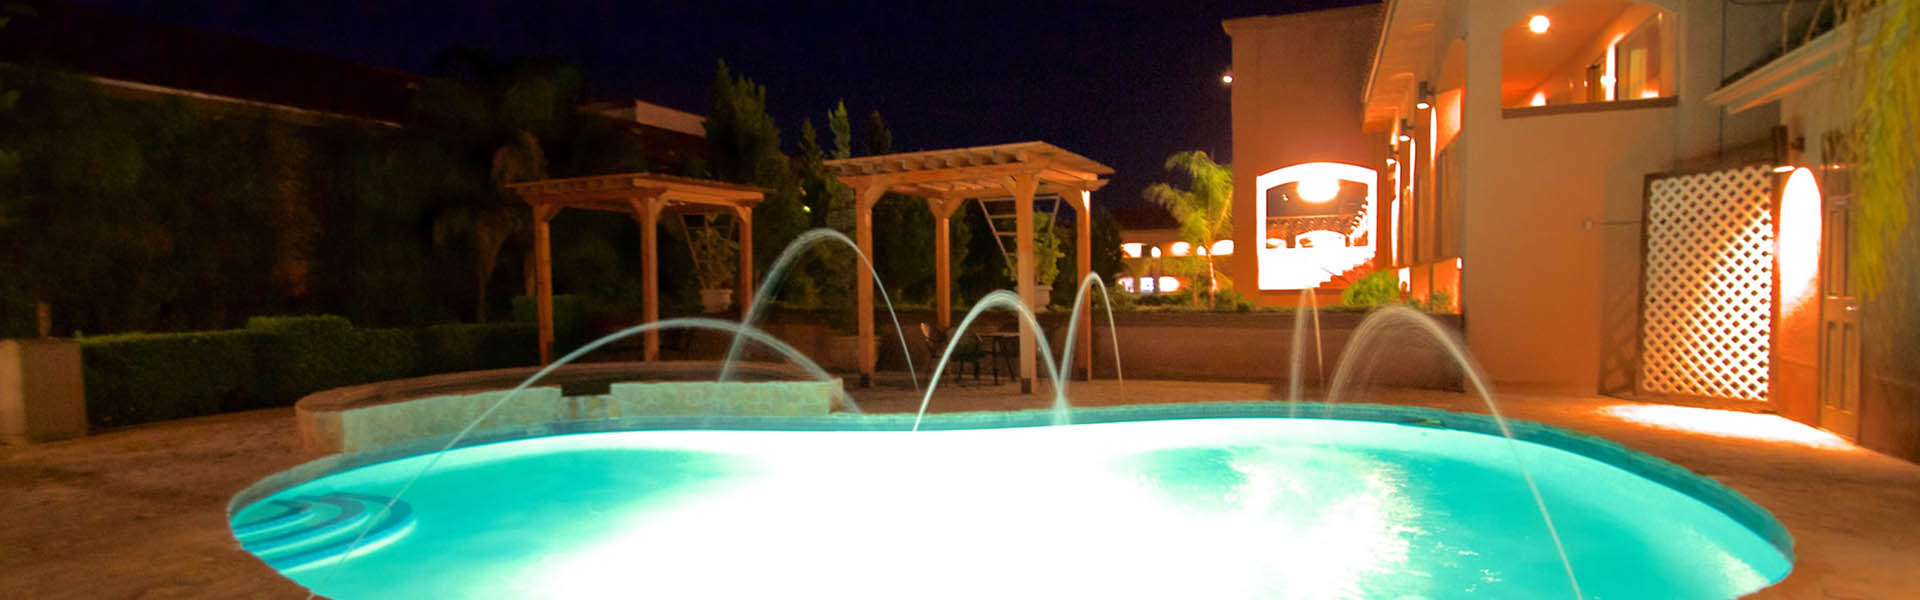 Hotel Estancia Inn